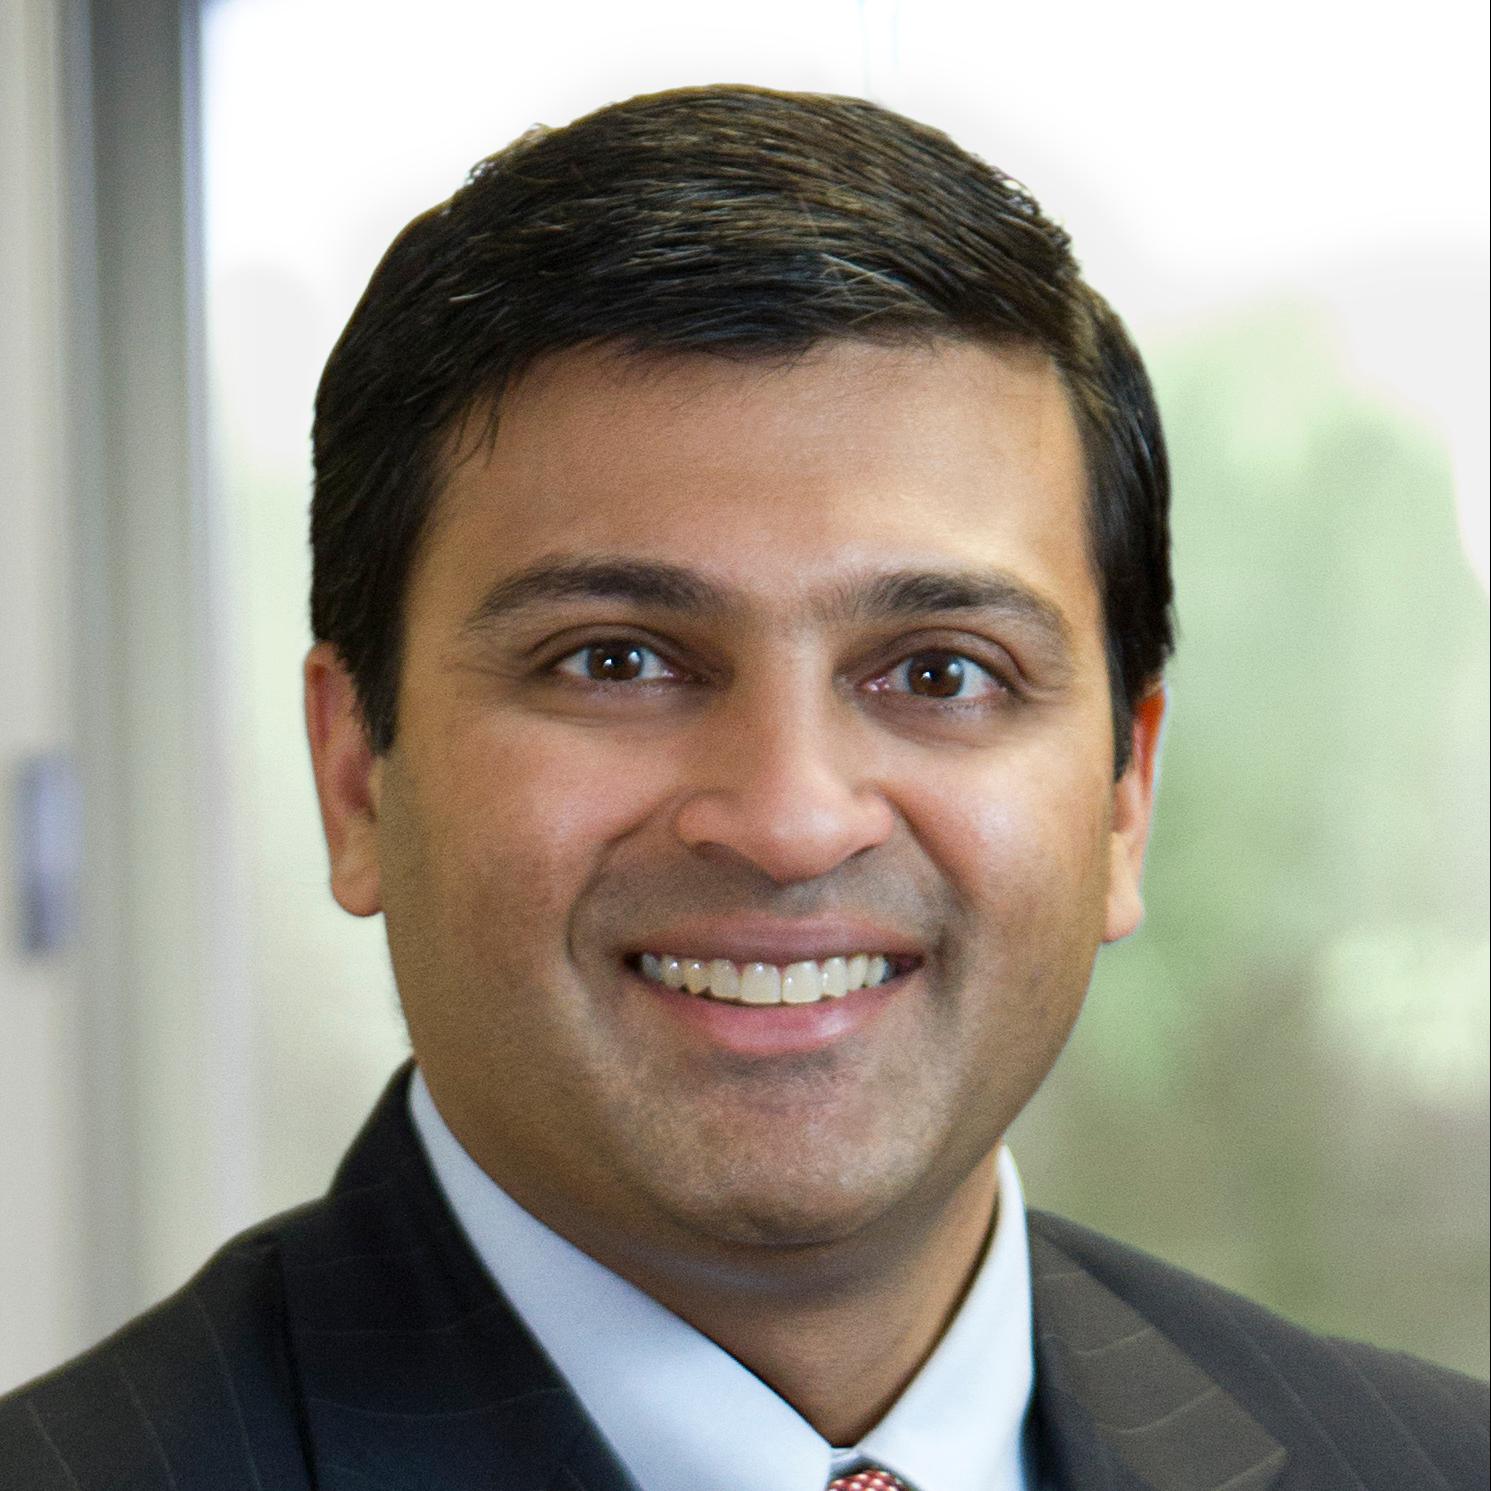 Prashant Bhatia, Chief Product & Marketing Officer at Stibo Systems